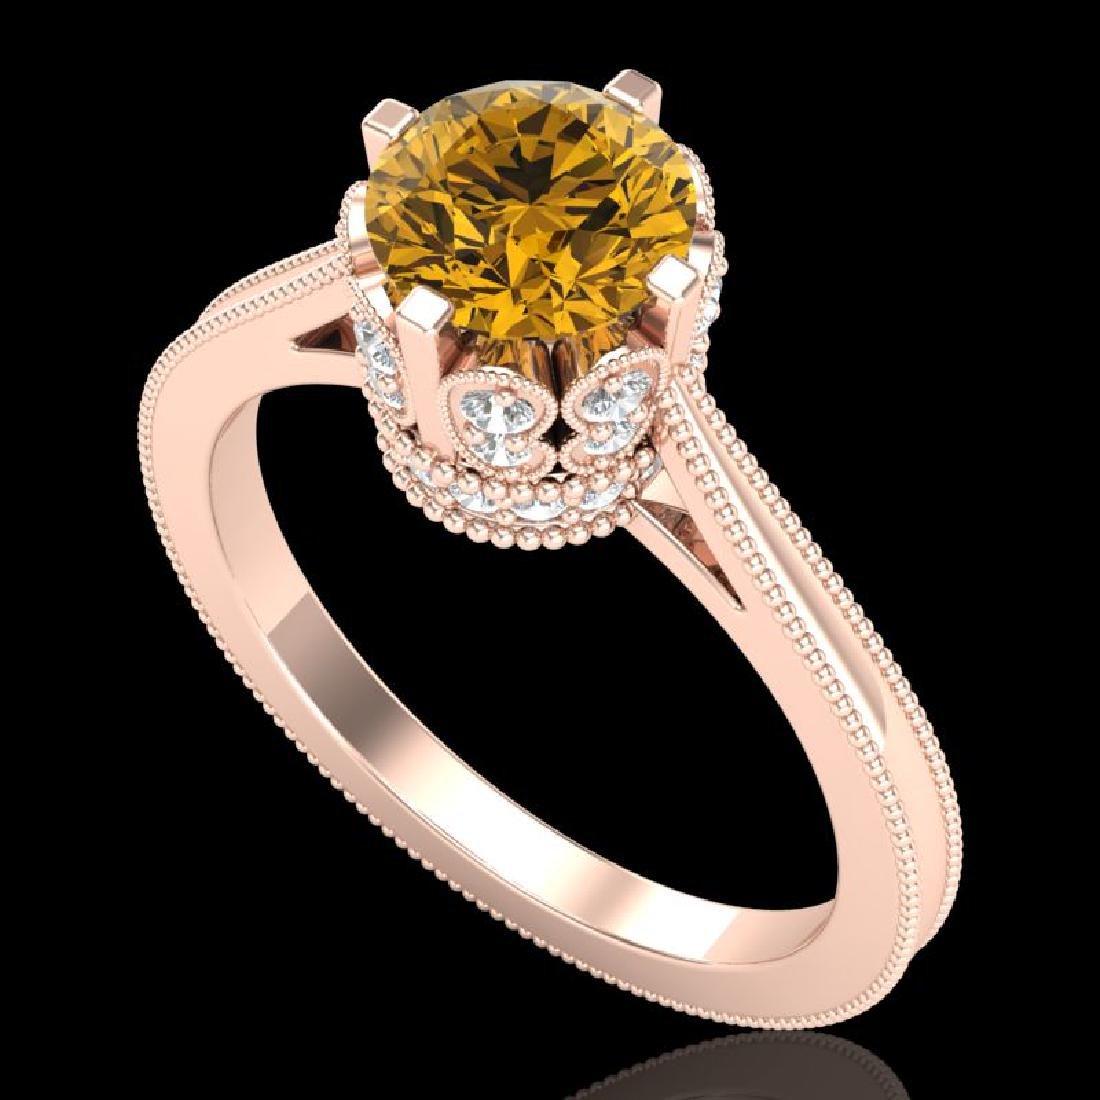 1.5 CTW Intense Fancy Yellow Diamond Engagement Art